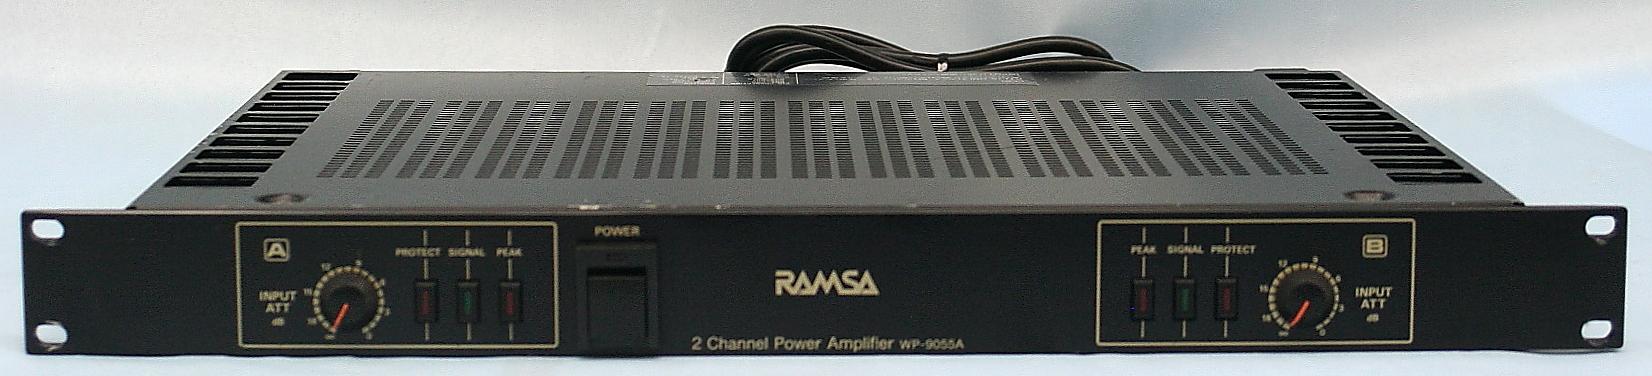 RAMSA パワーアンプ WP-9055A